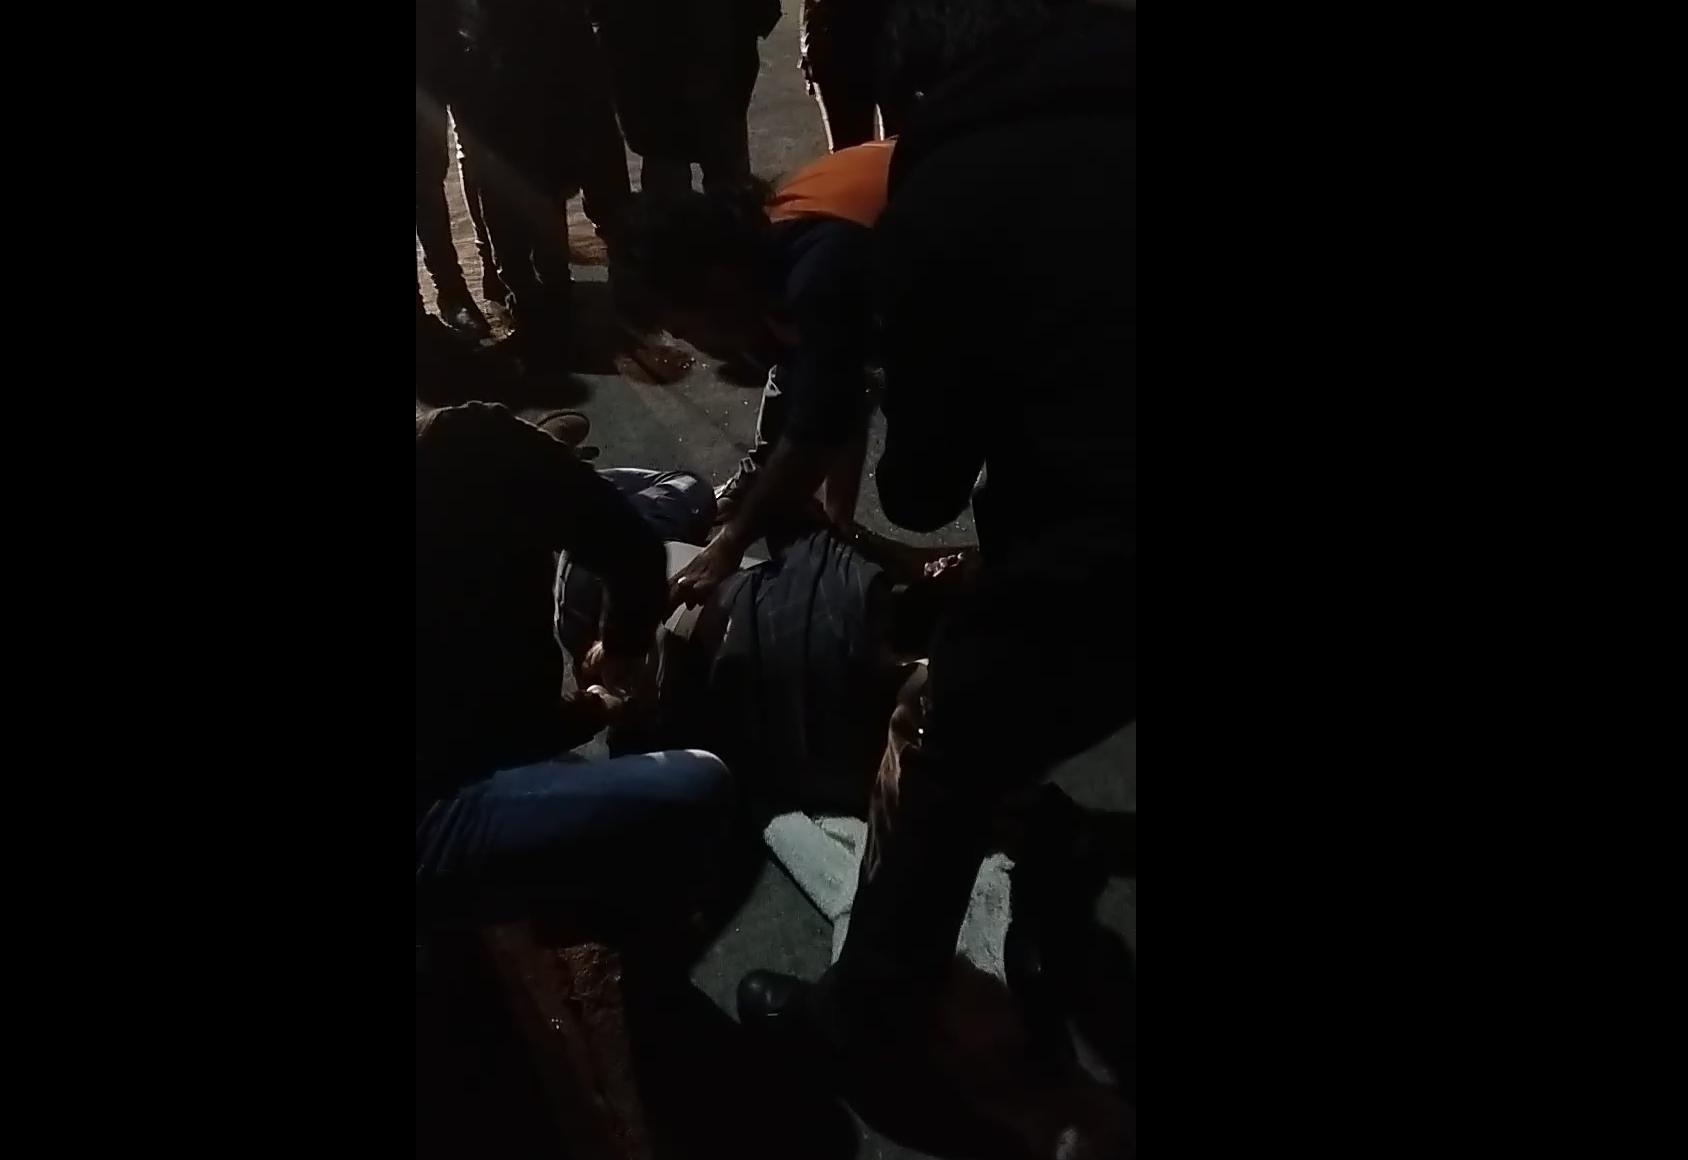 Comerciante es baleado en intento de asalto en Texmelucan